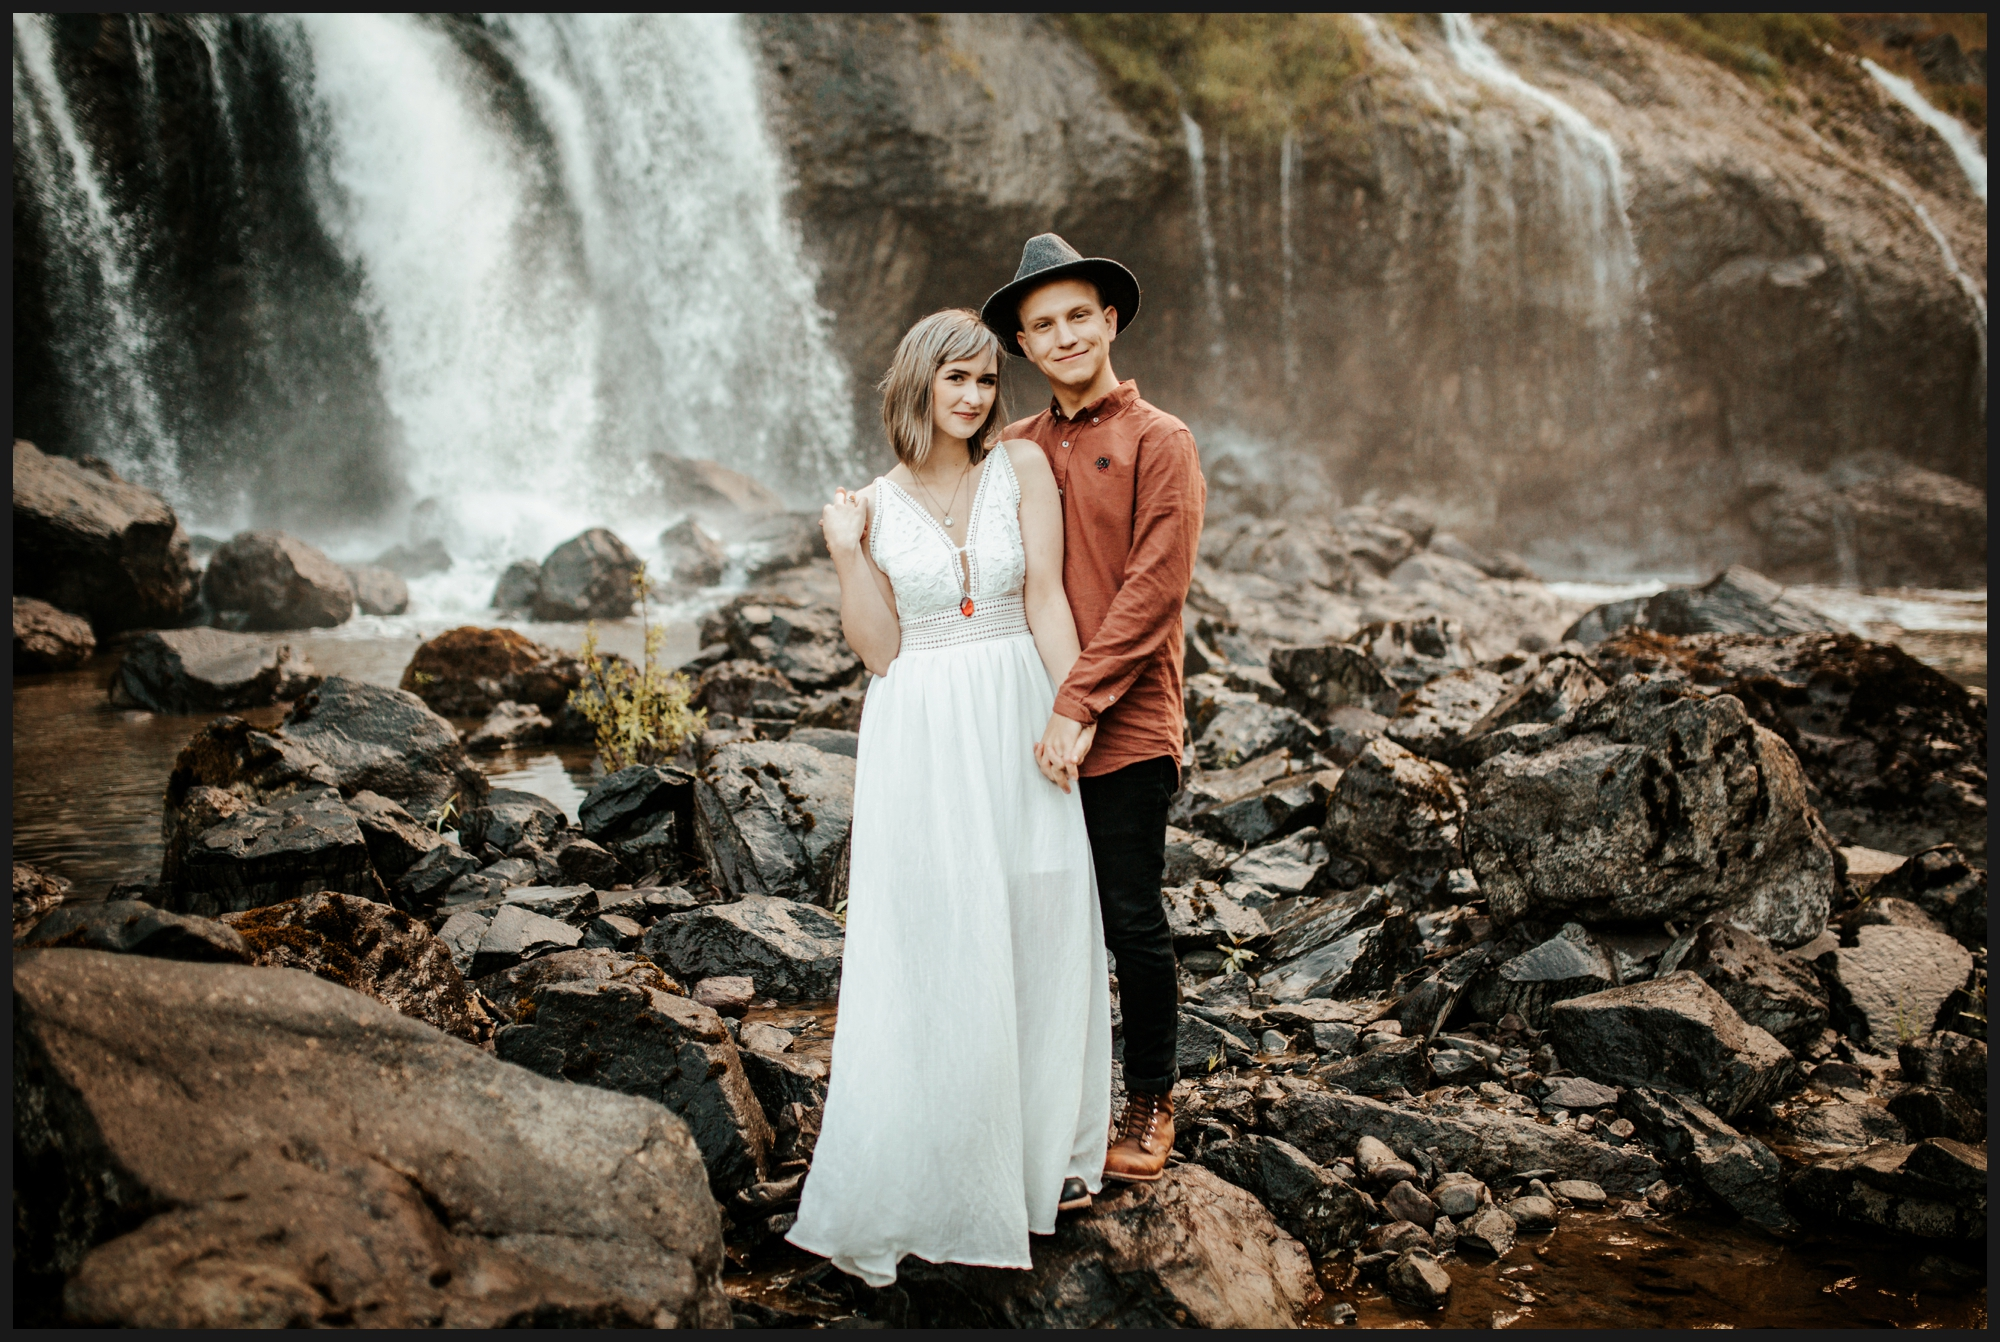 Orlando-Wedding-Photographer-destination-wedding-photographer-florida-wedding-photographer-bohemian-wedding-photographer_0425.jpg